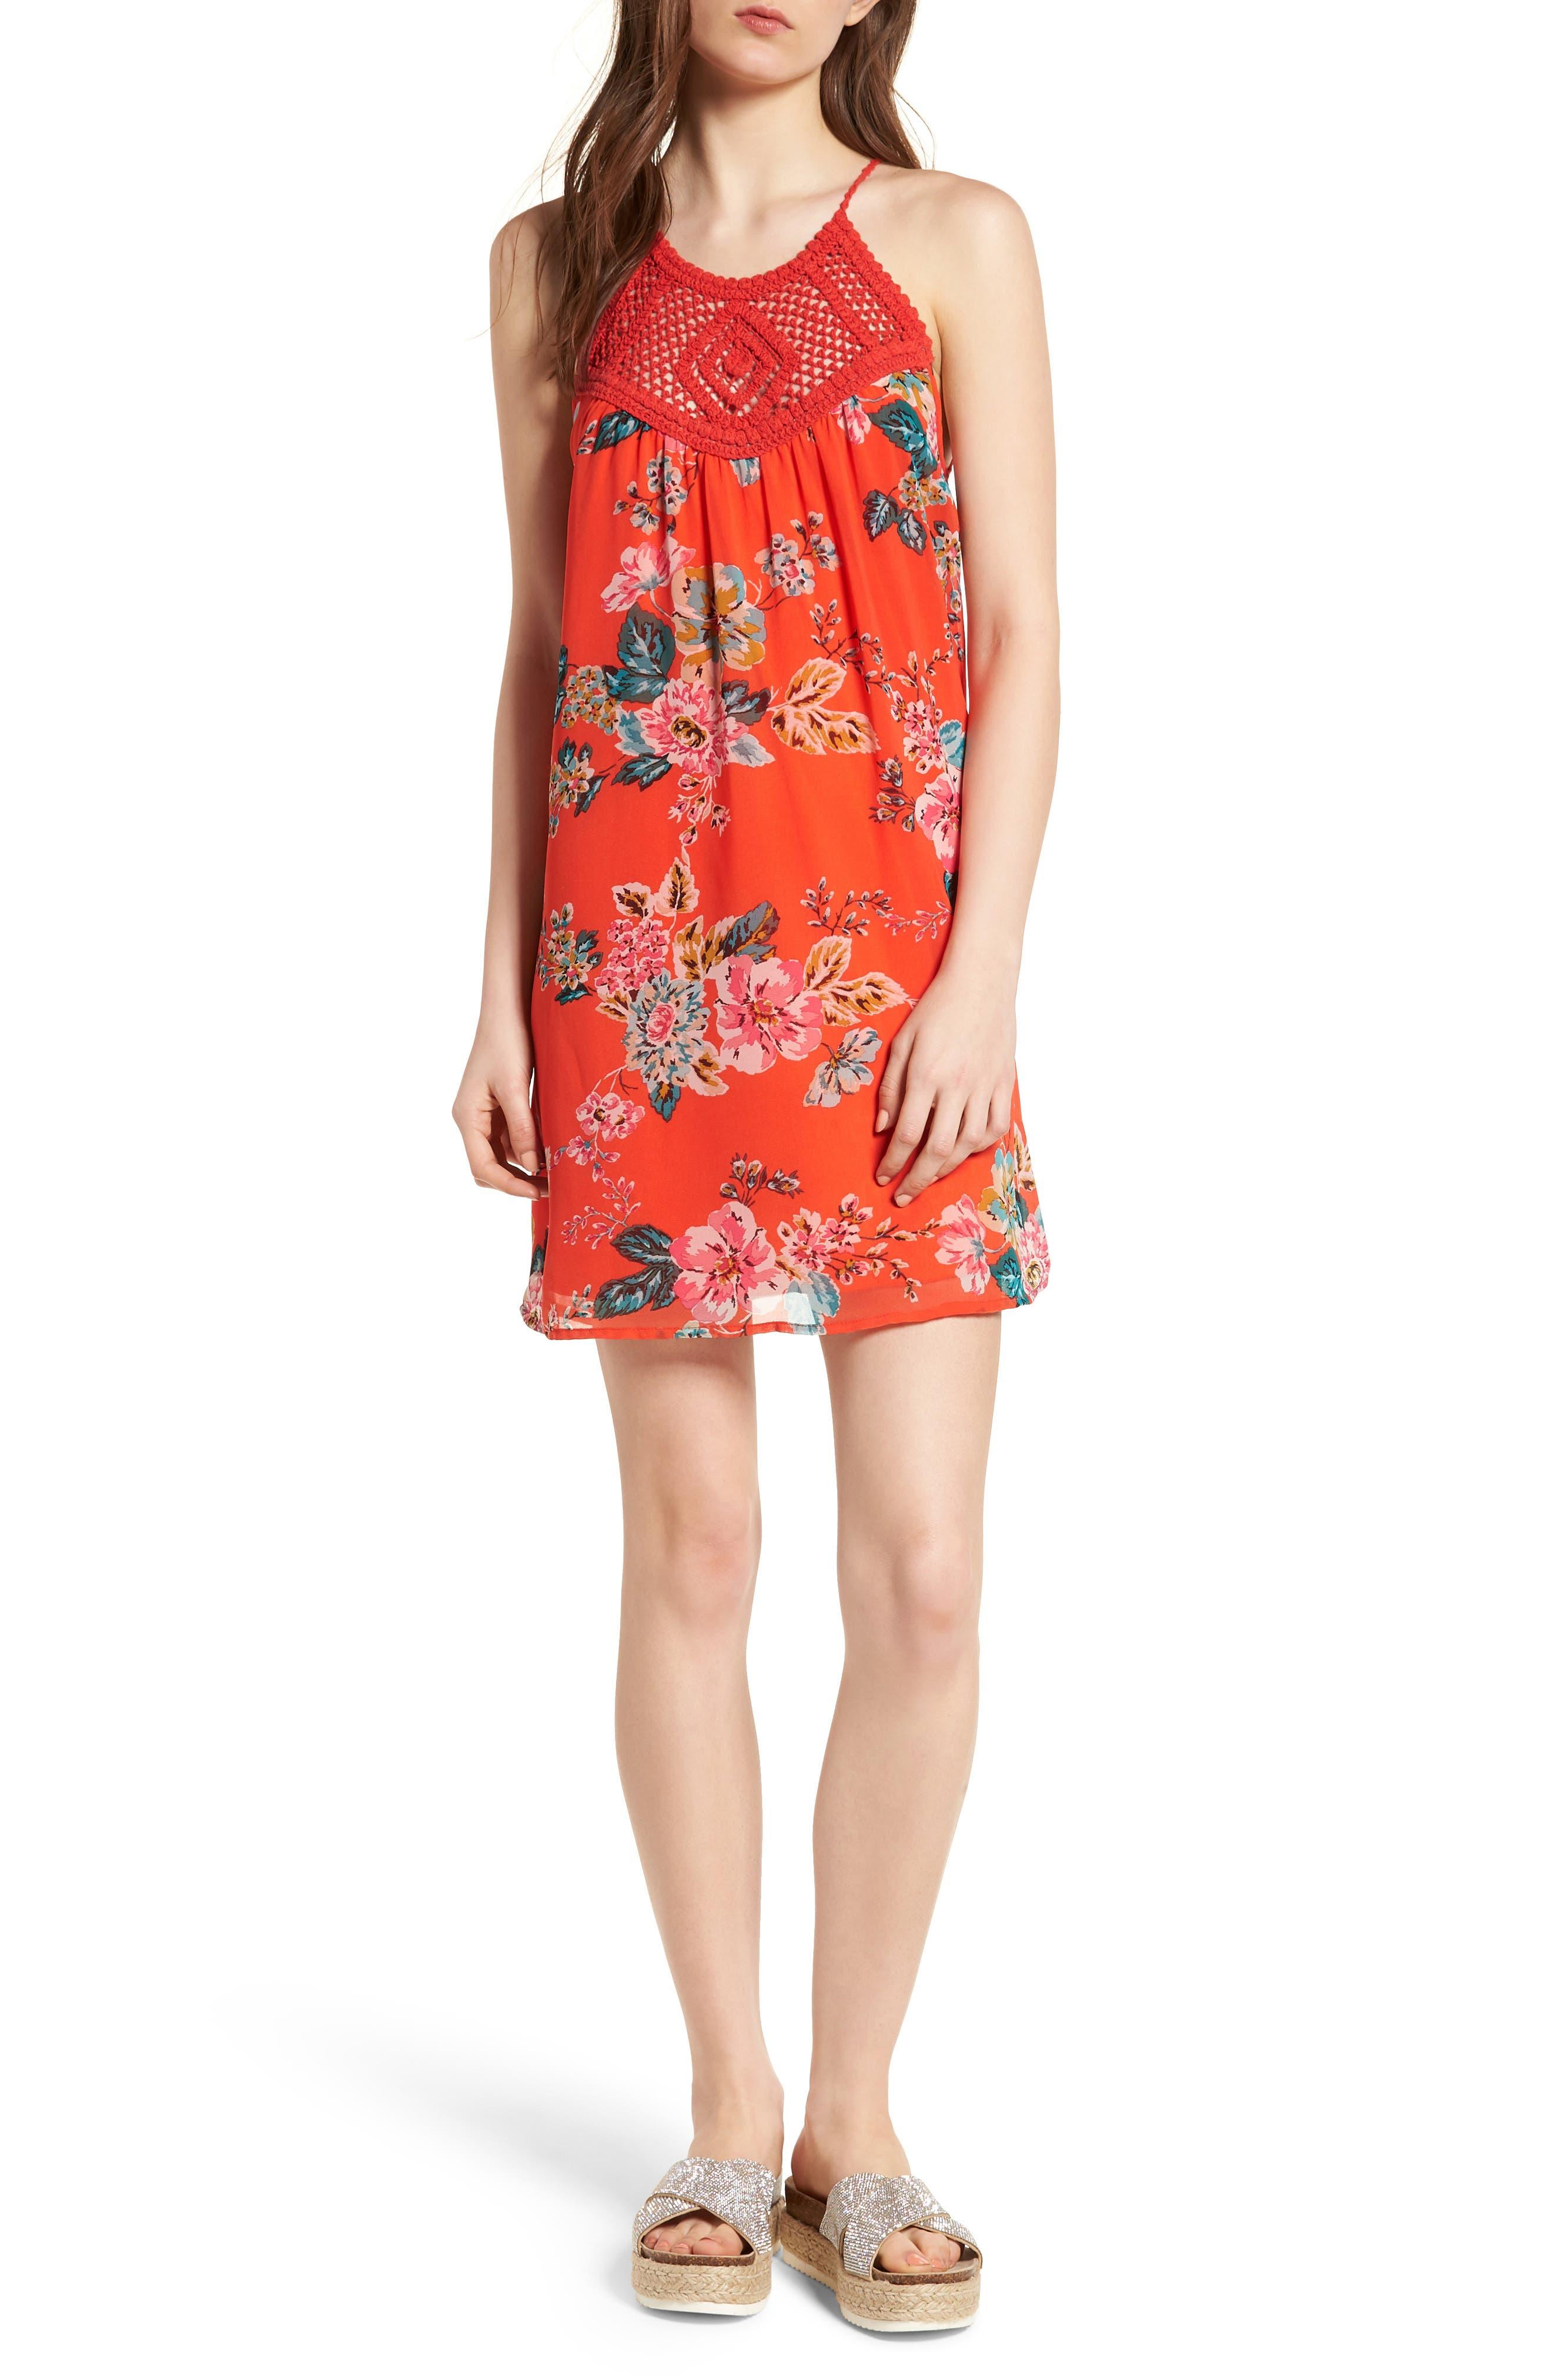 SPEECHLESS Crochet Swing Dress, Main, color, 800